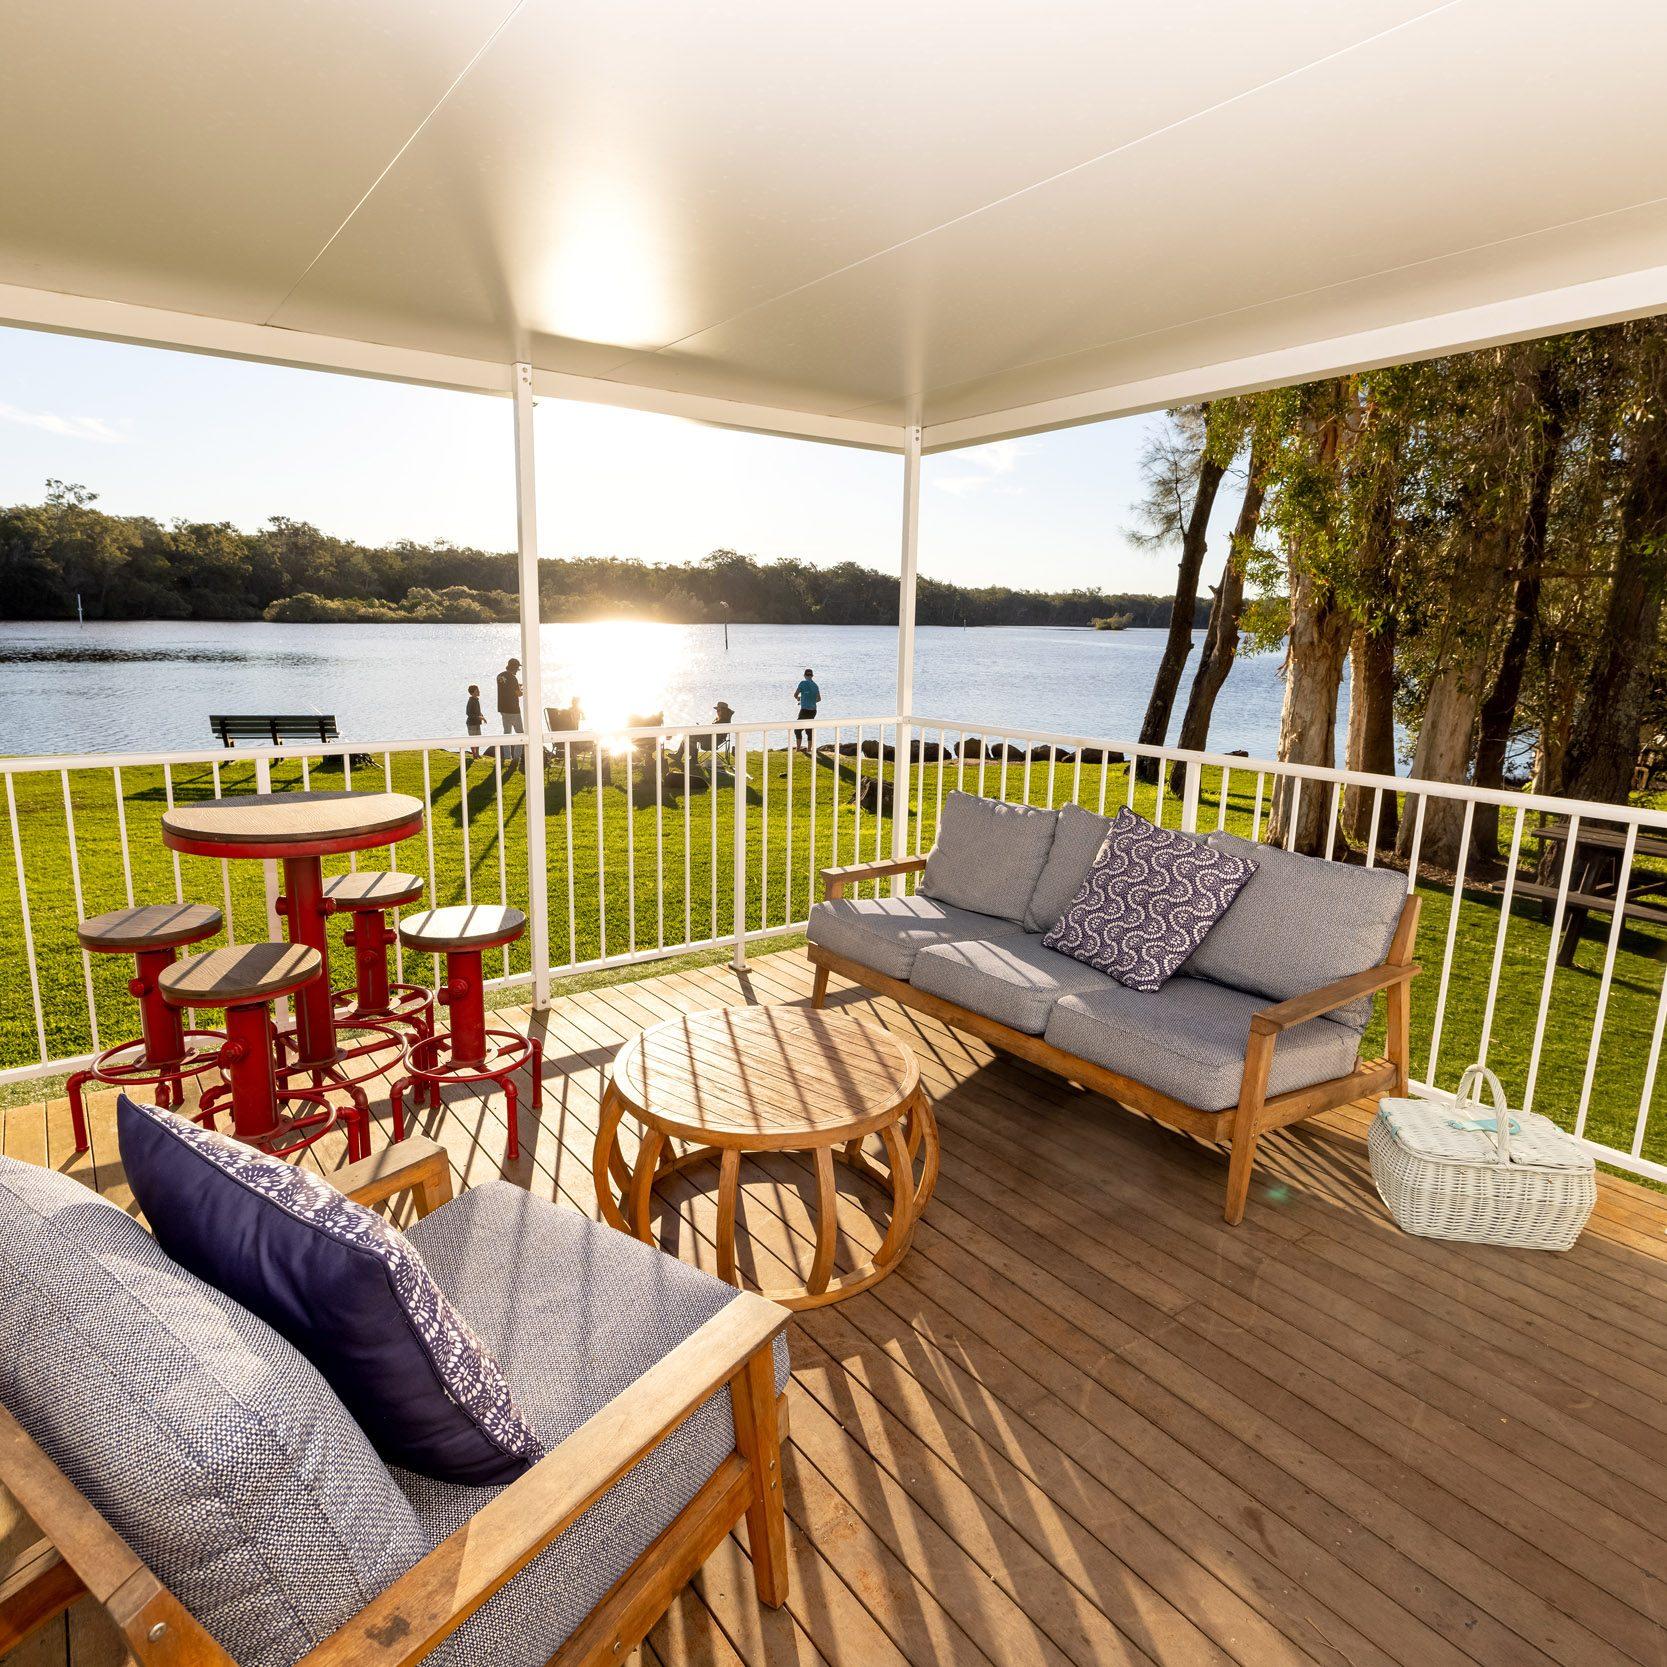 3 Bedroom Luxury River View Villa - Veranda